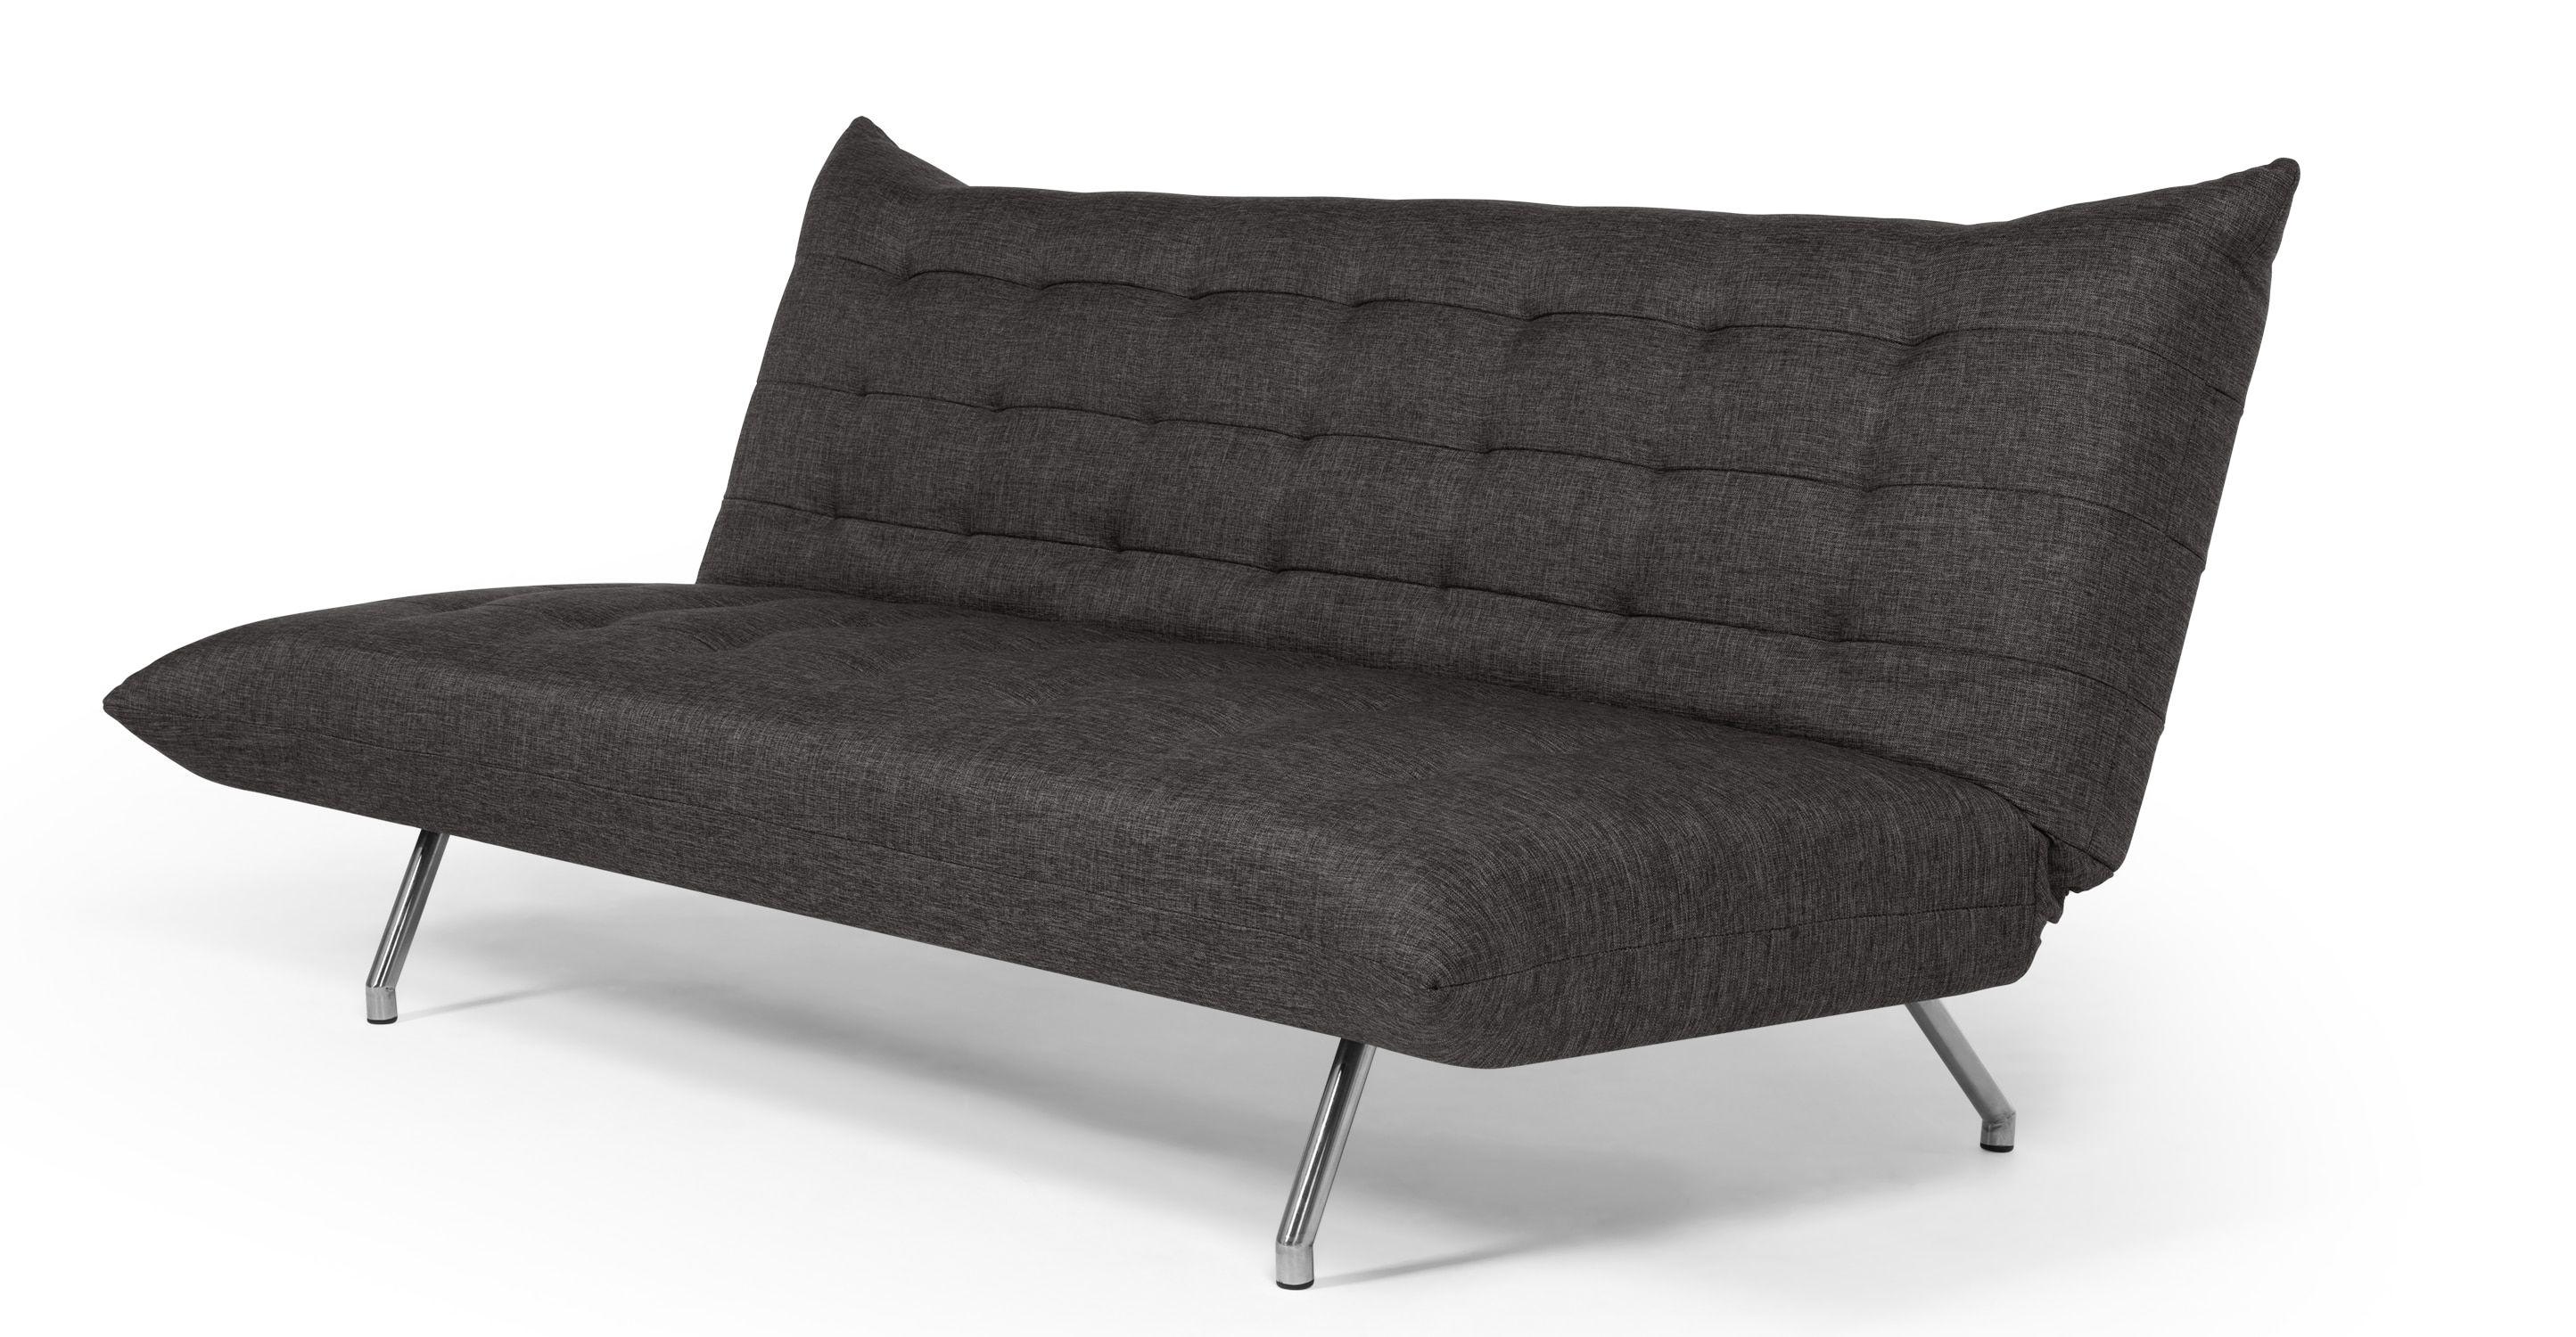 keiko sofa bed cygnet grey all about pets pinterest spare rh pinterest com